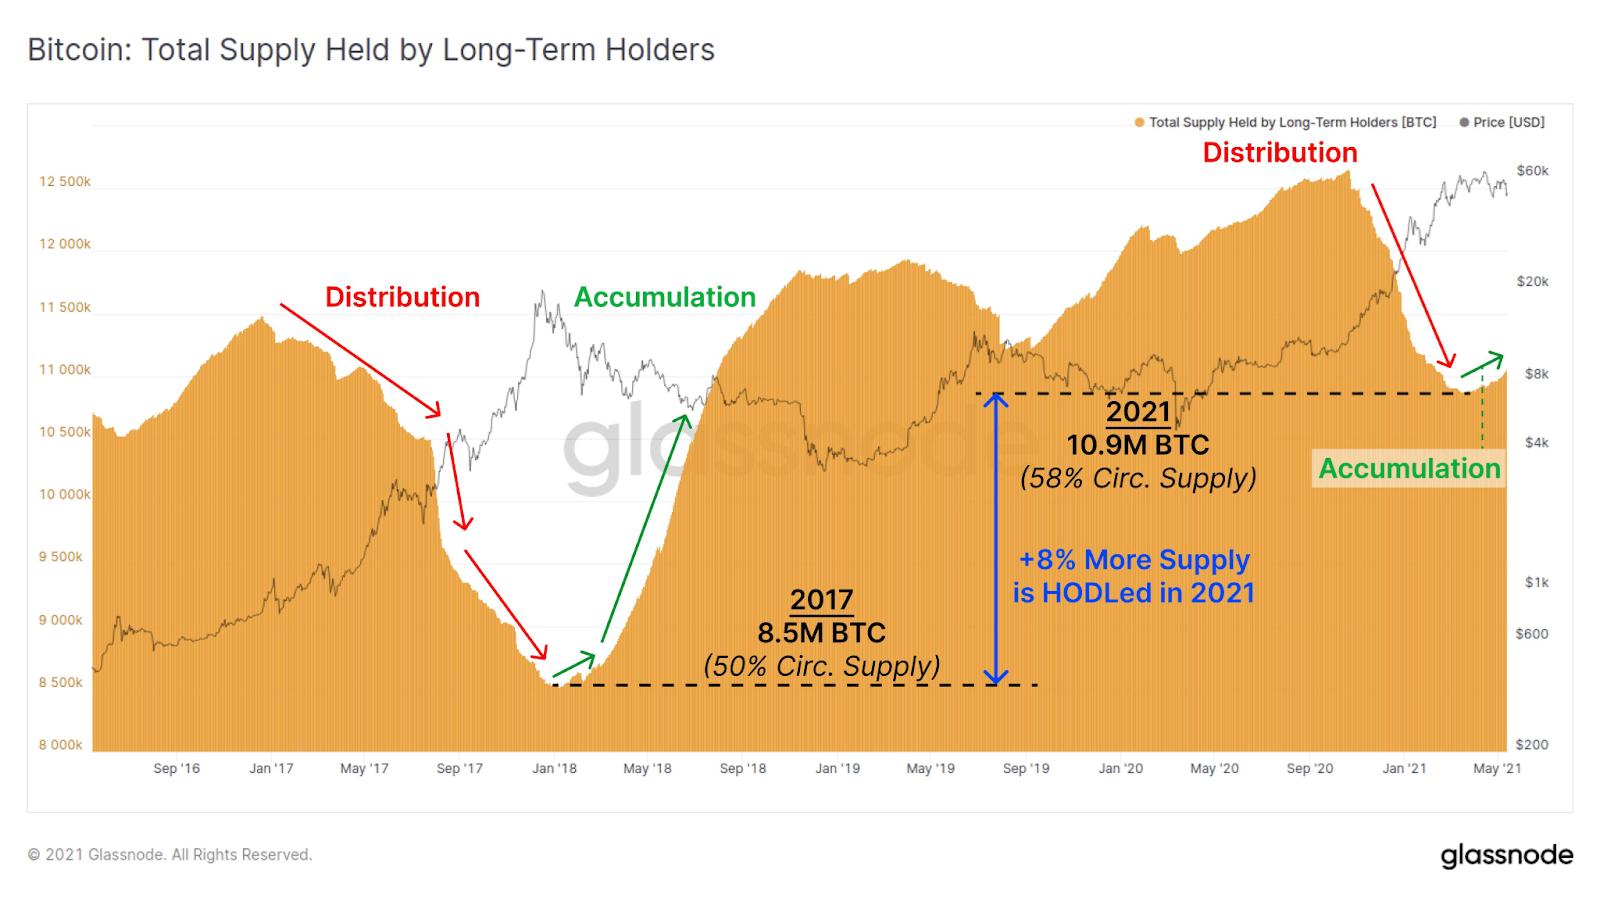 Bitcoin BTC Long-Term Holders Total Supply